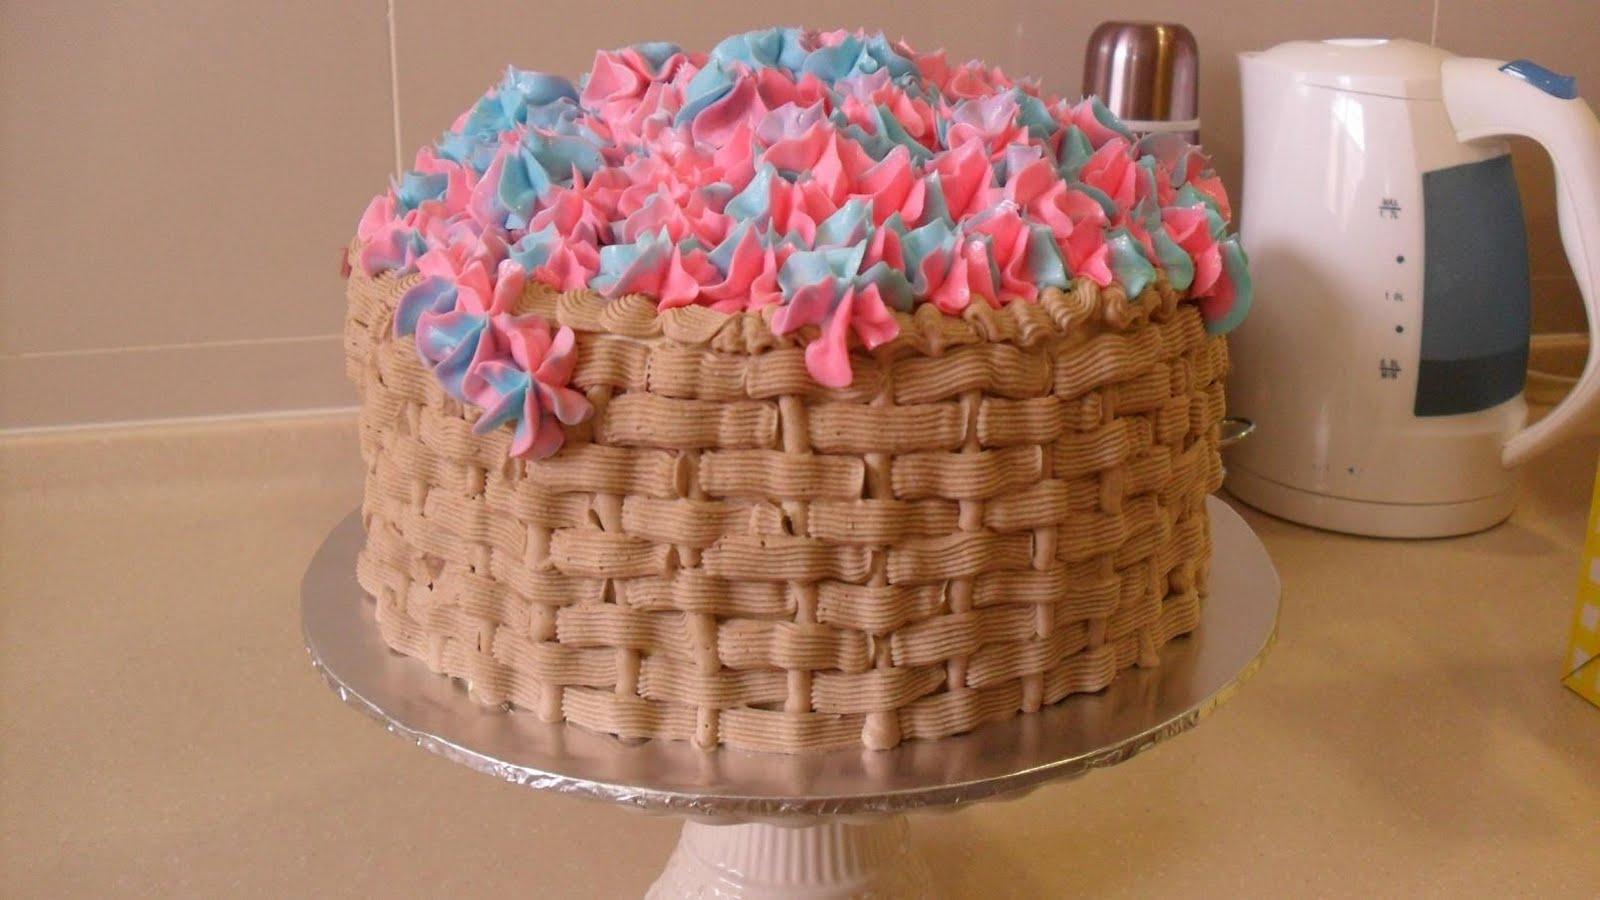 Italian Rainbow Cake Flowers In Basket For Hudra Swirl Of Colors